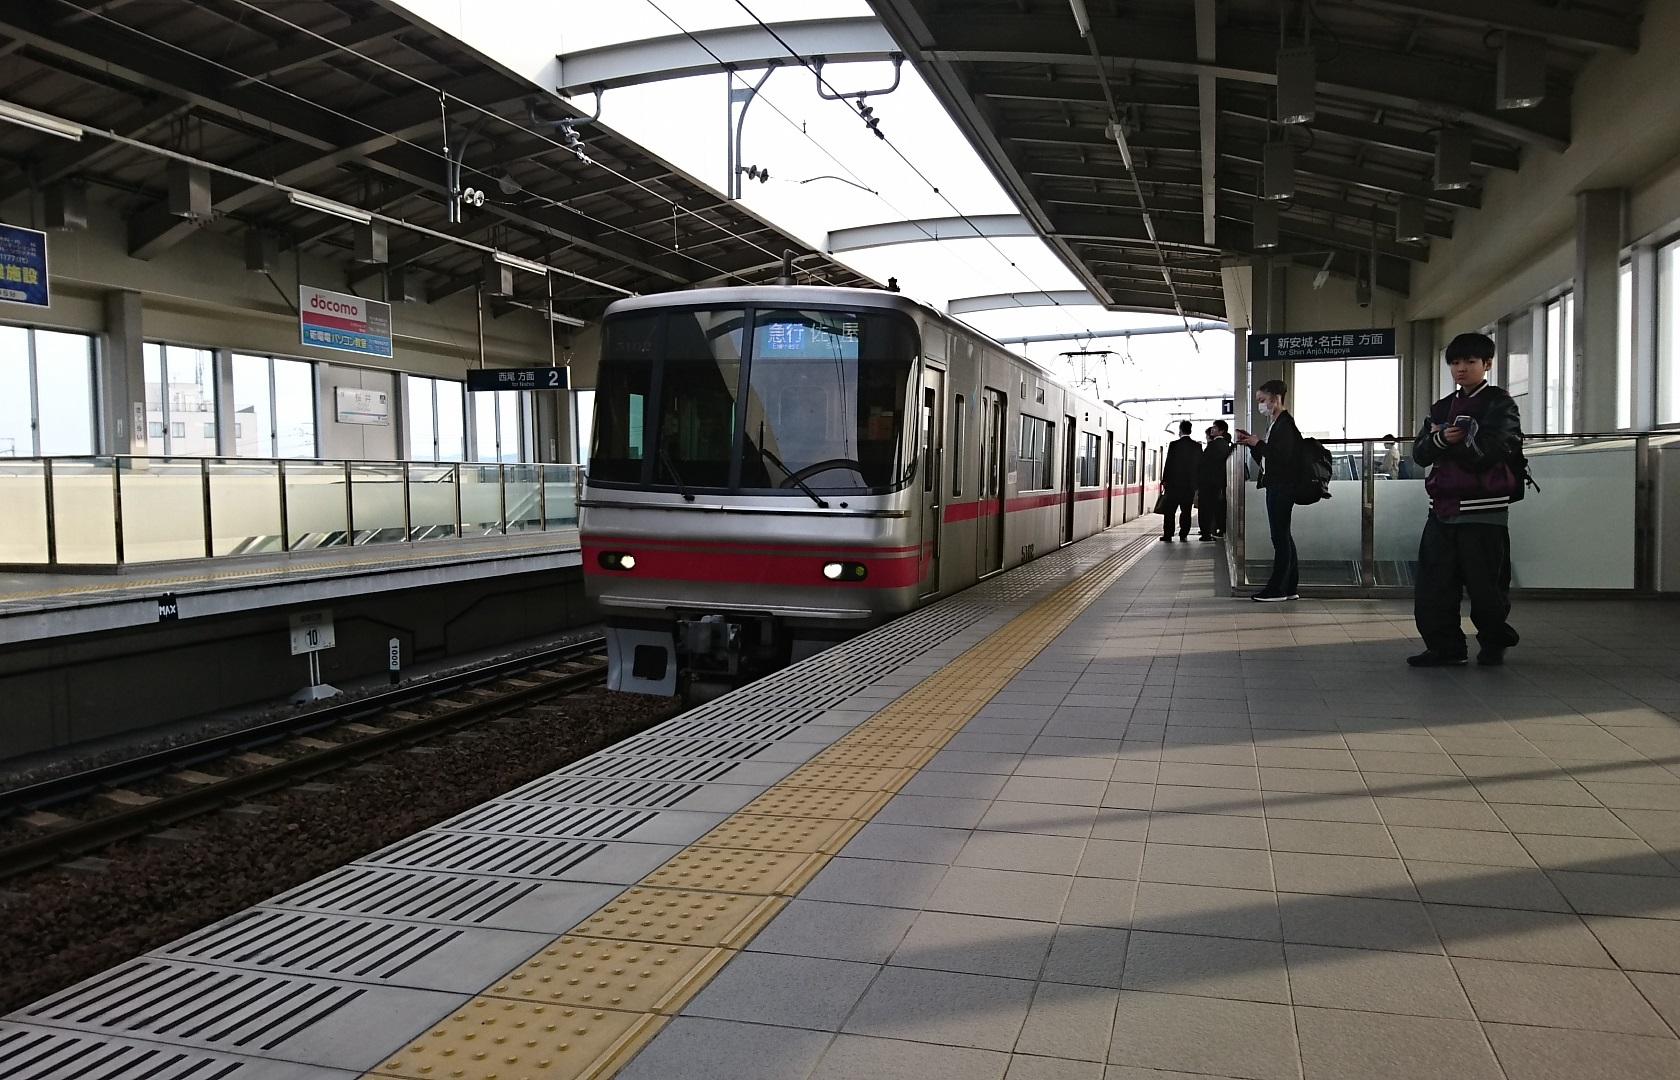 2018.3.15 名鉄 (3) 桜井 - 佐屋いき急行(5002編成4両) 1680-1080